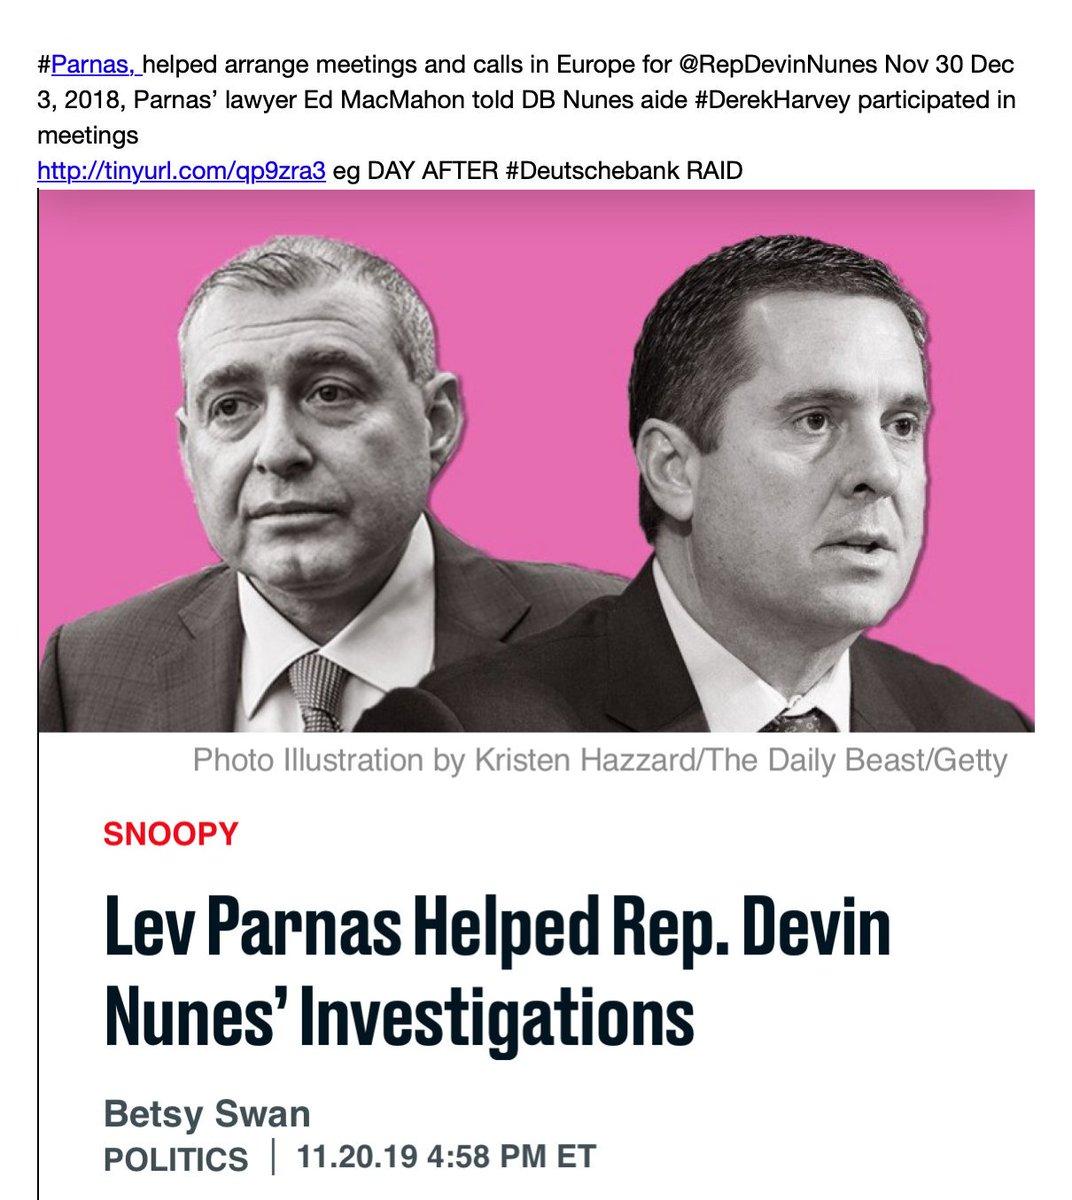 @anneapplebaum #TimesUp #Enough cover up SEE  WHY breaking now. @Lawrence @MSNBC    @SethAbramson @maddow @NBCNews @RichardEngel @BuzzFeed @cnni @Billbrowder @jane__bradley @JamesFourM  @LincolnsBible @WPJohnWagner @DavidCornDC  @CREWcrew @RepAdamSchiff @SpeakerPelosi.